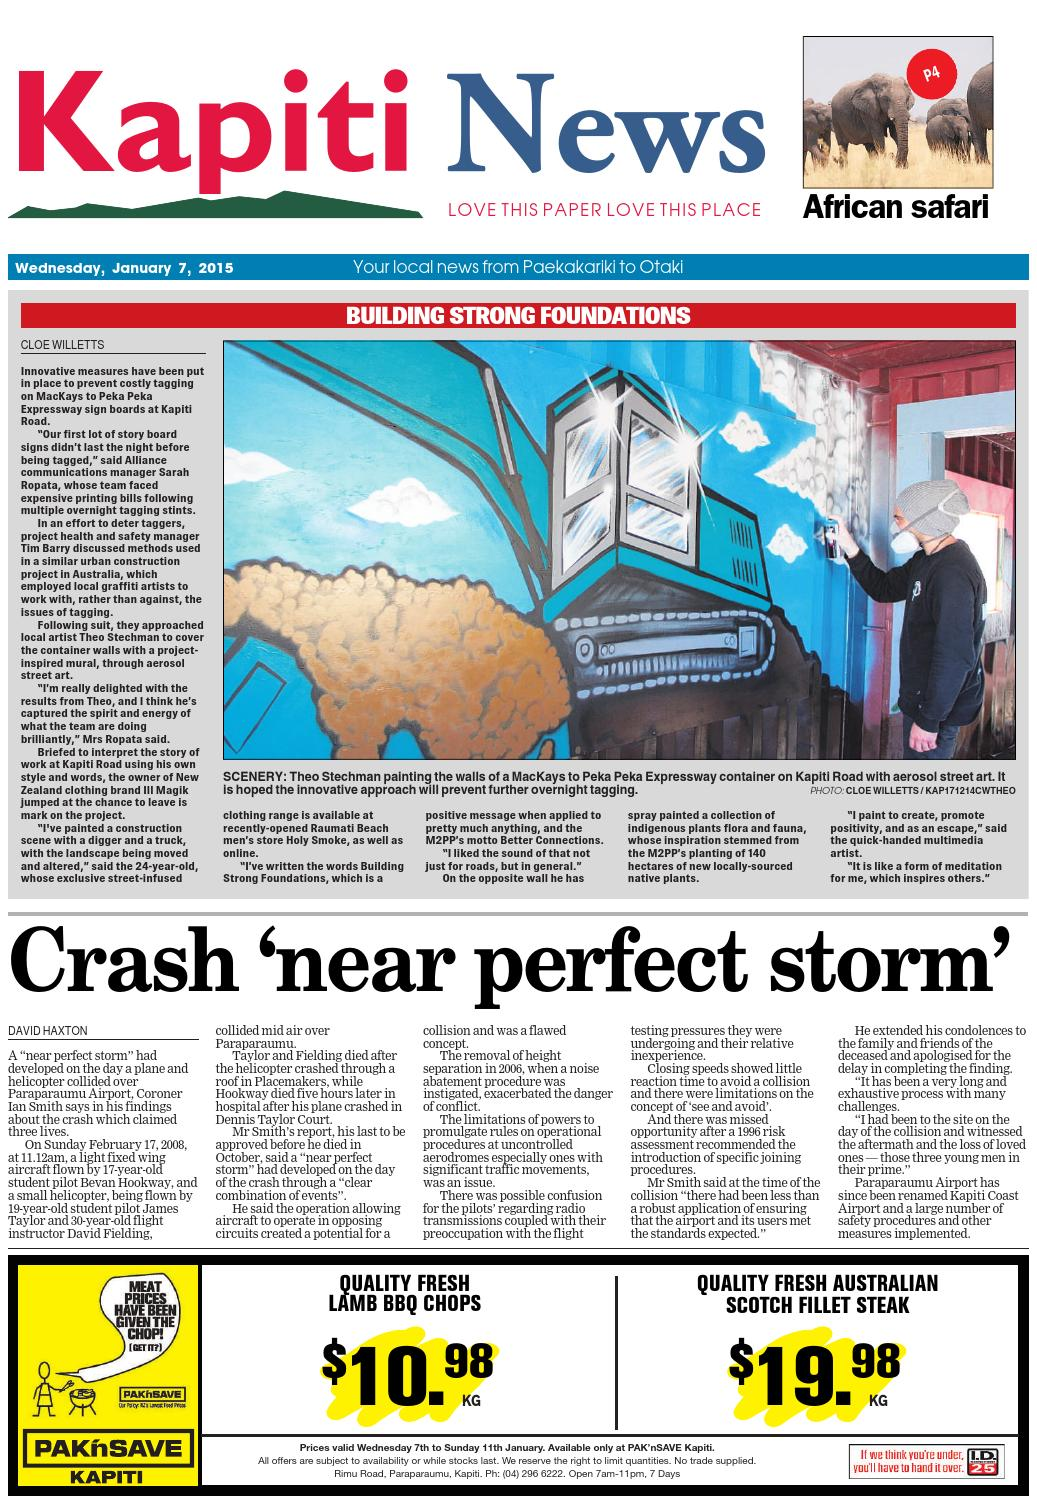 Kapiti news 07 01 15 by local newspapers issuu fandeluxe Choice Image